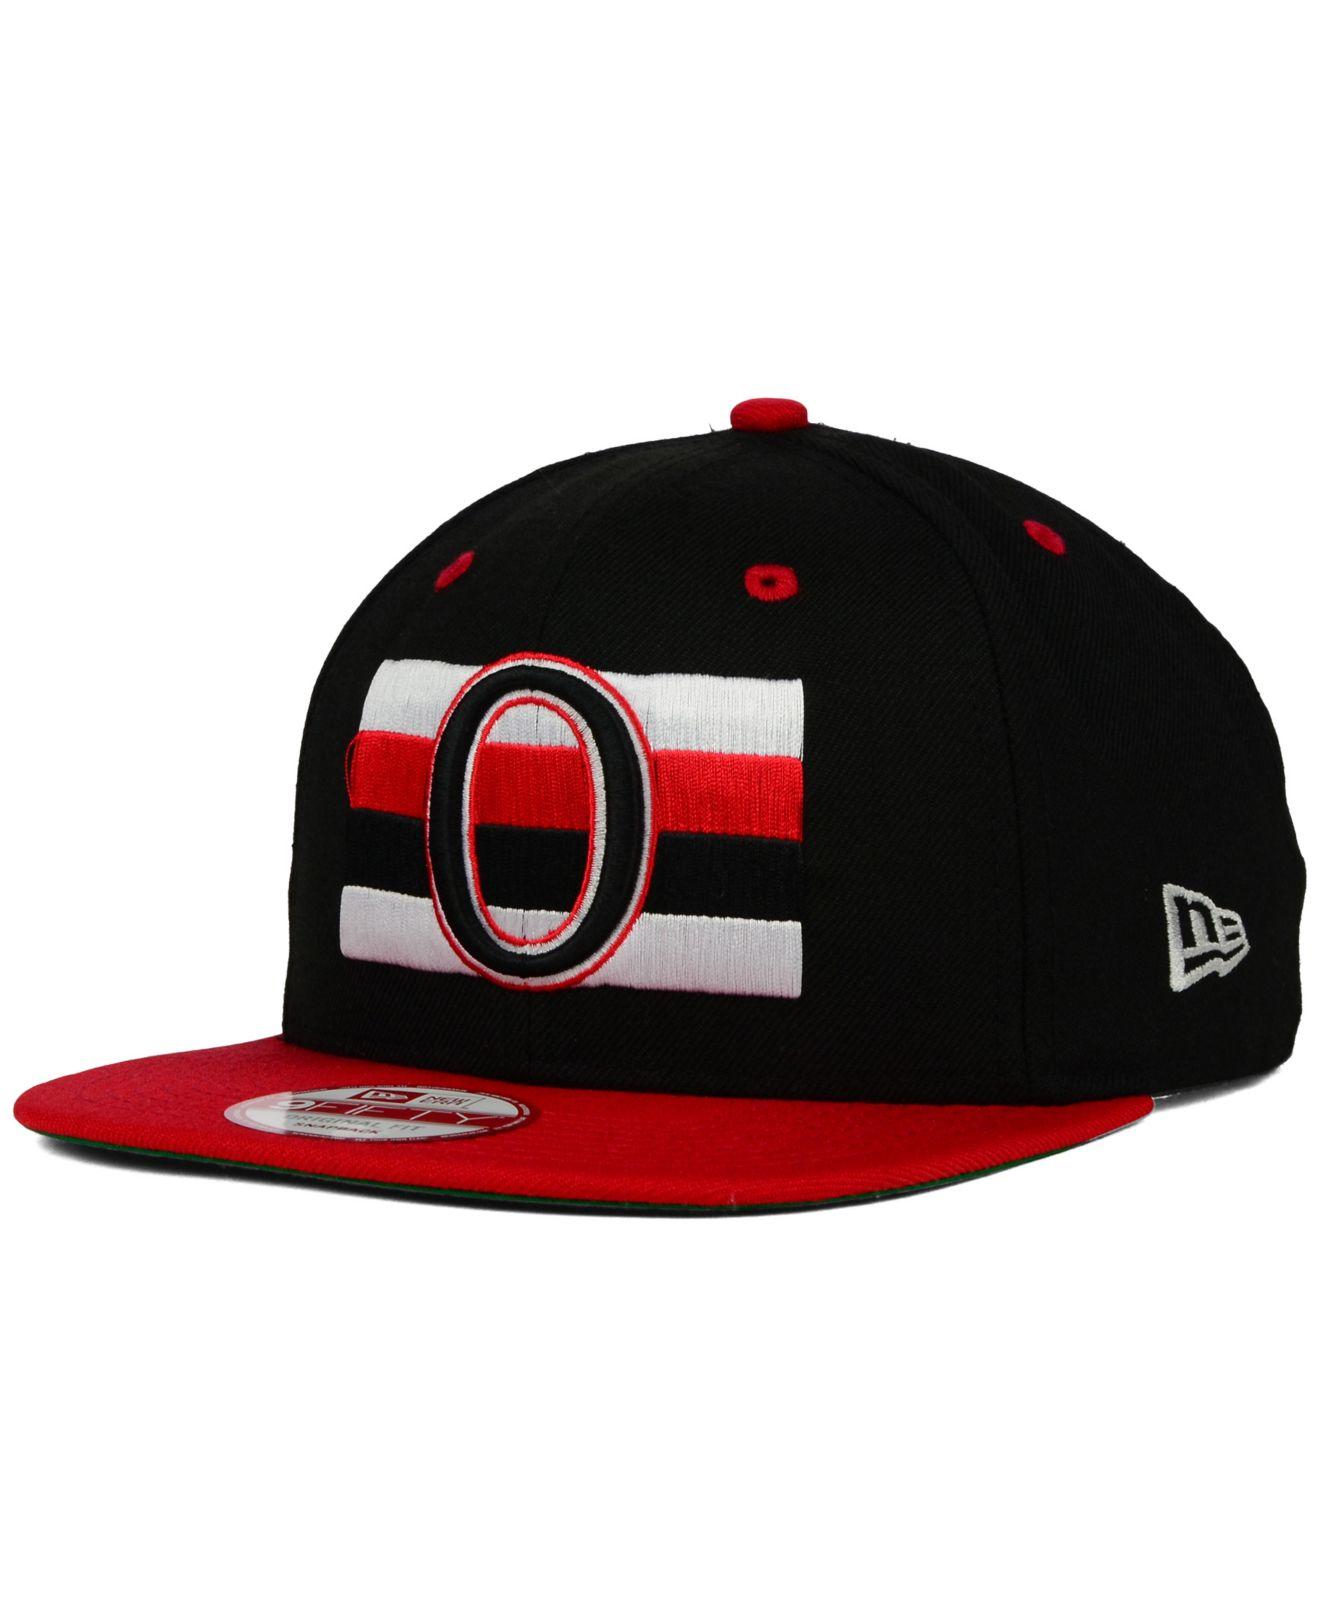 finest selection 16027 92e29 KTZ Ottawa Senators Vintage 2-tone 9fifty Snapback Cap in Black for ...